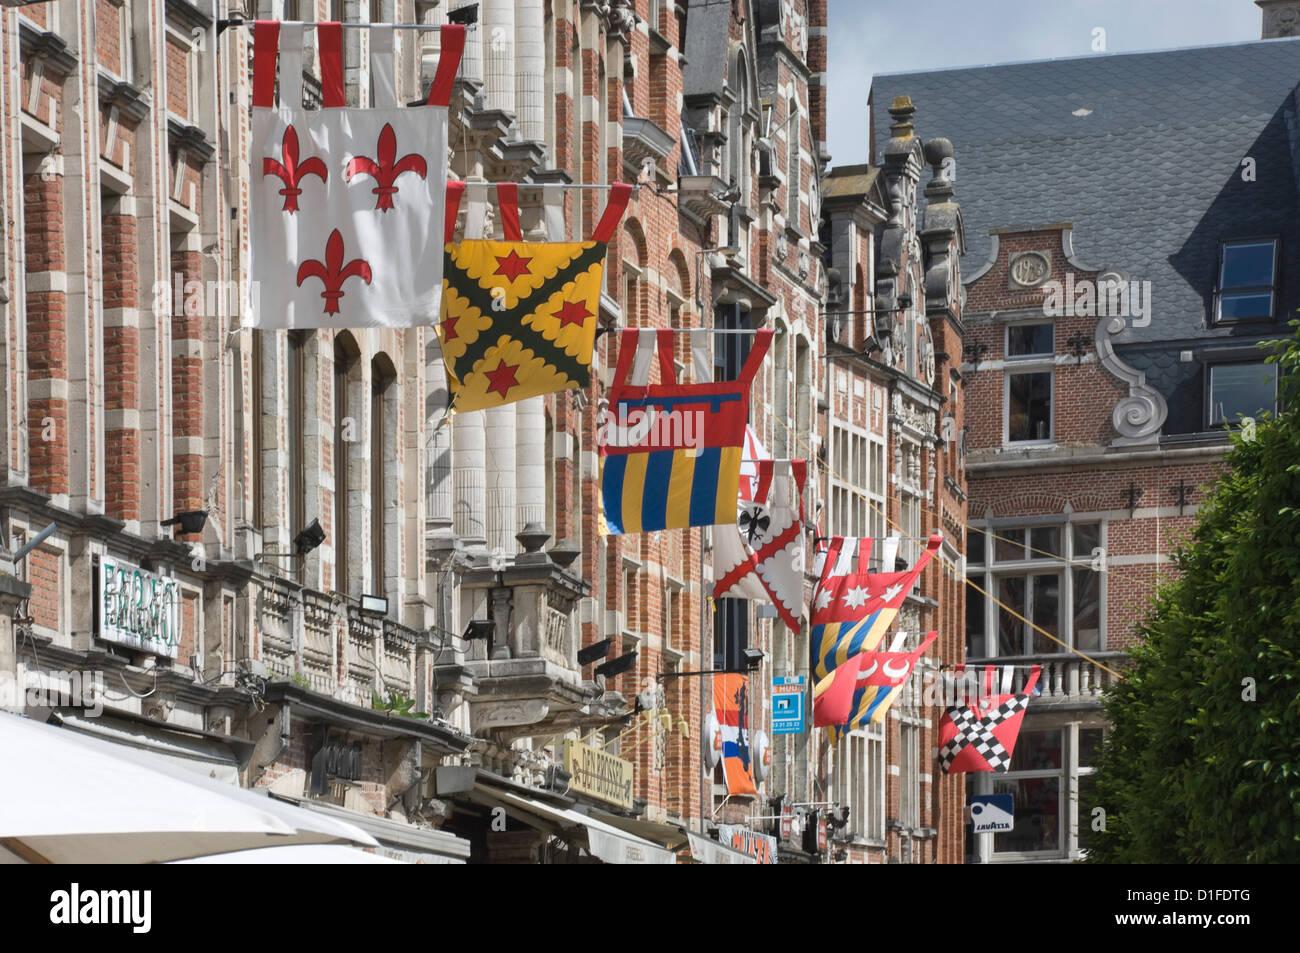 Heraldic banners decorate the Flemish gables in Leuven, Belgium, Europe - Stock Image